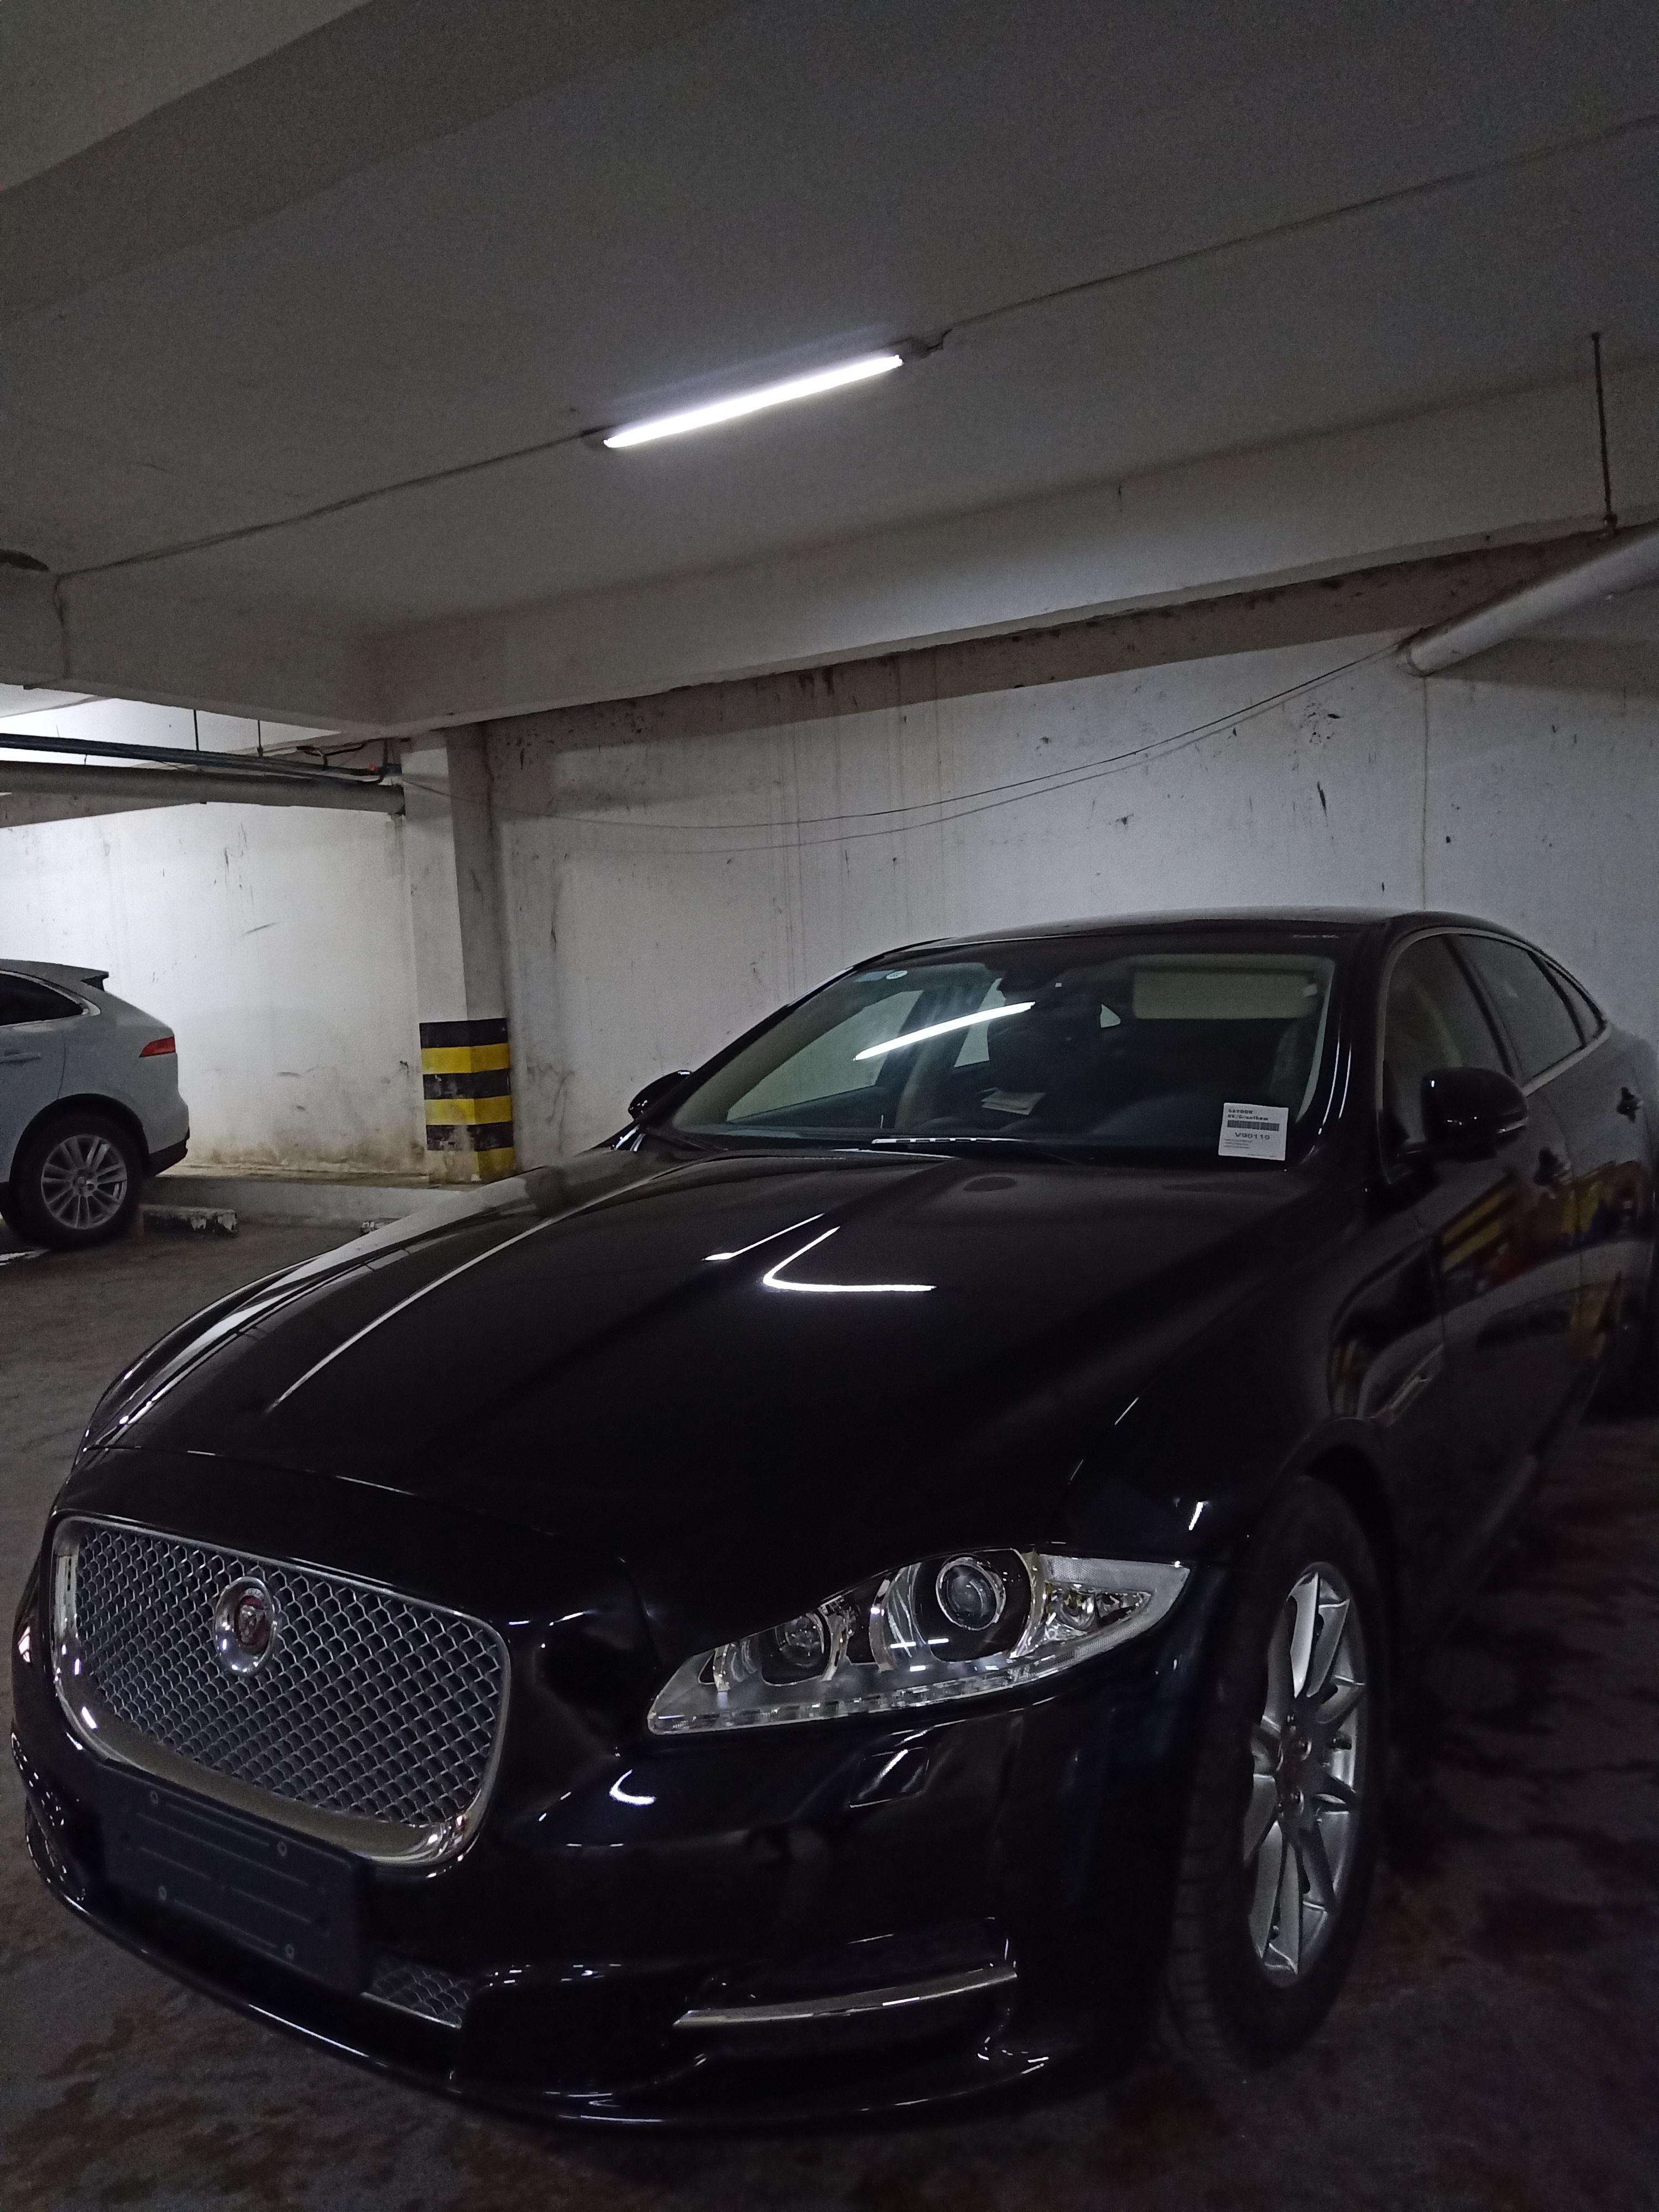 jaguar_xj_2012_used.jpg